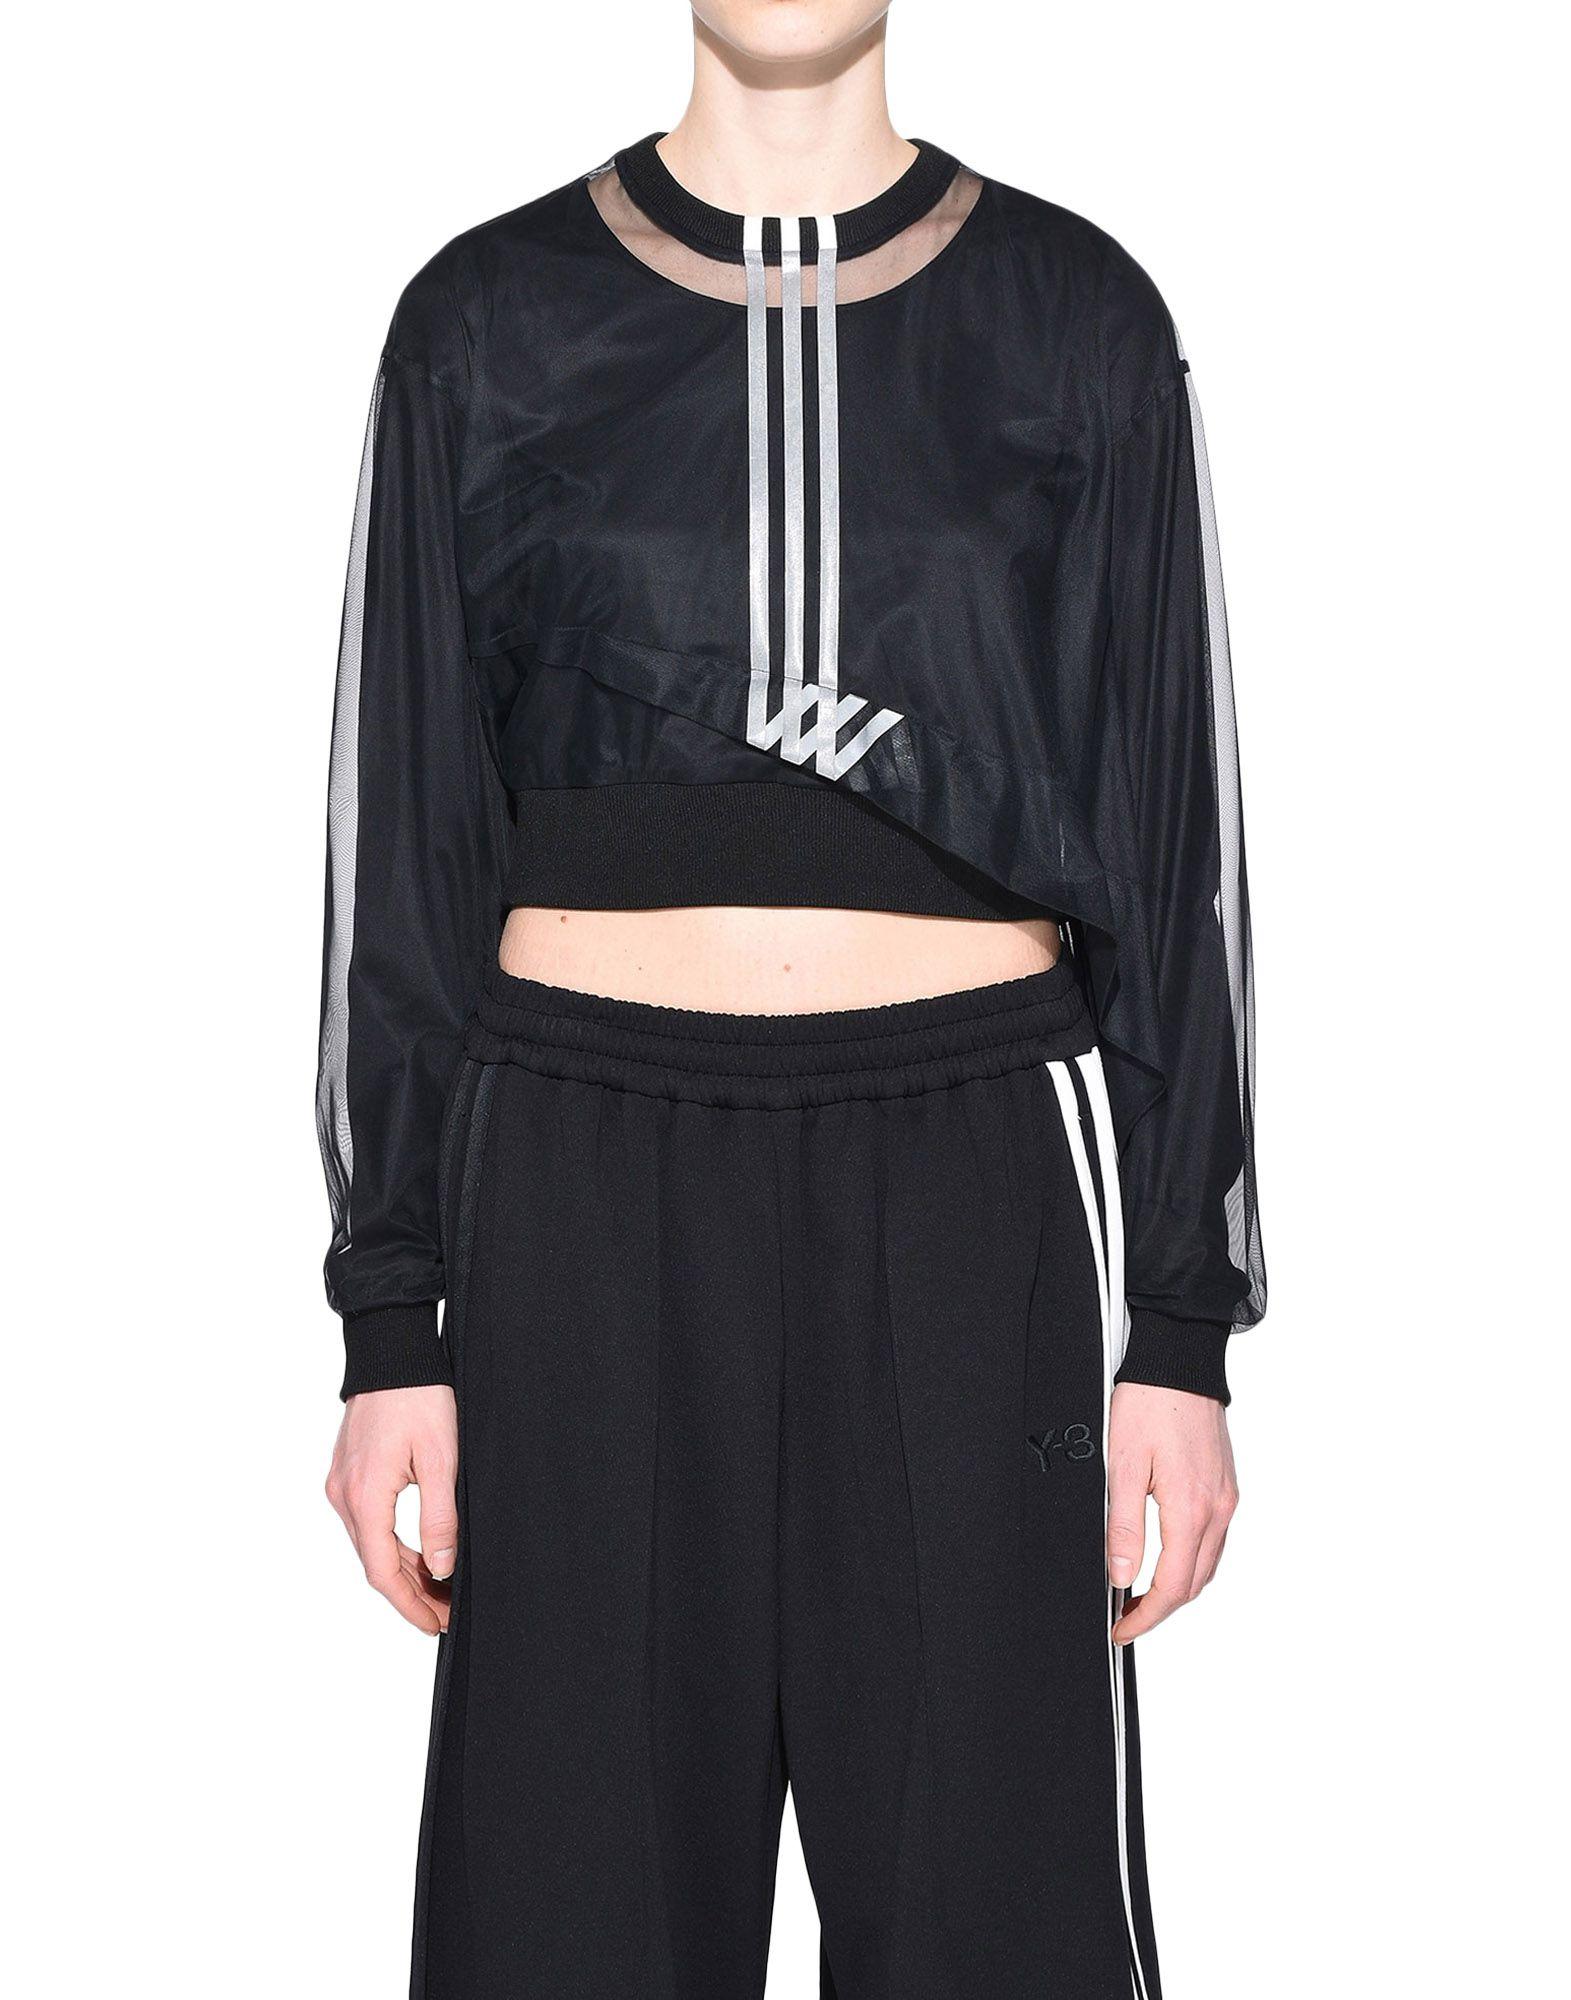 Y-3 Y-3 3-Stripes Mesh Cropped Tee Long sleeve t-shirt Woman r